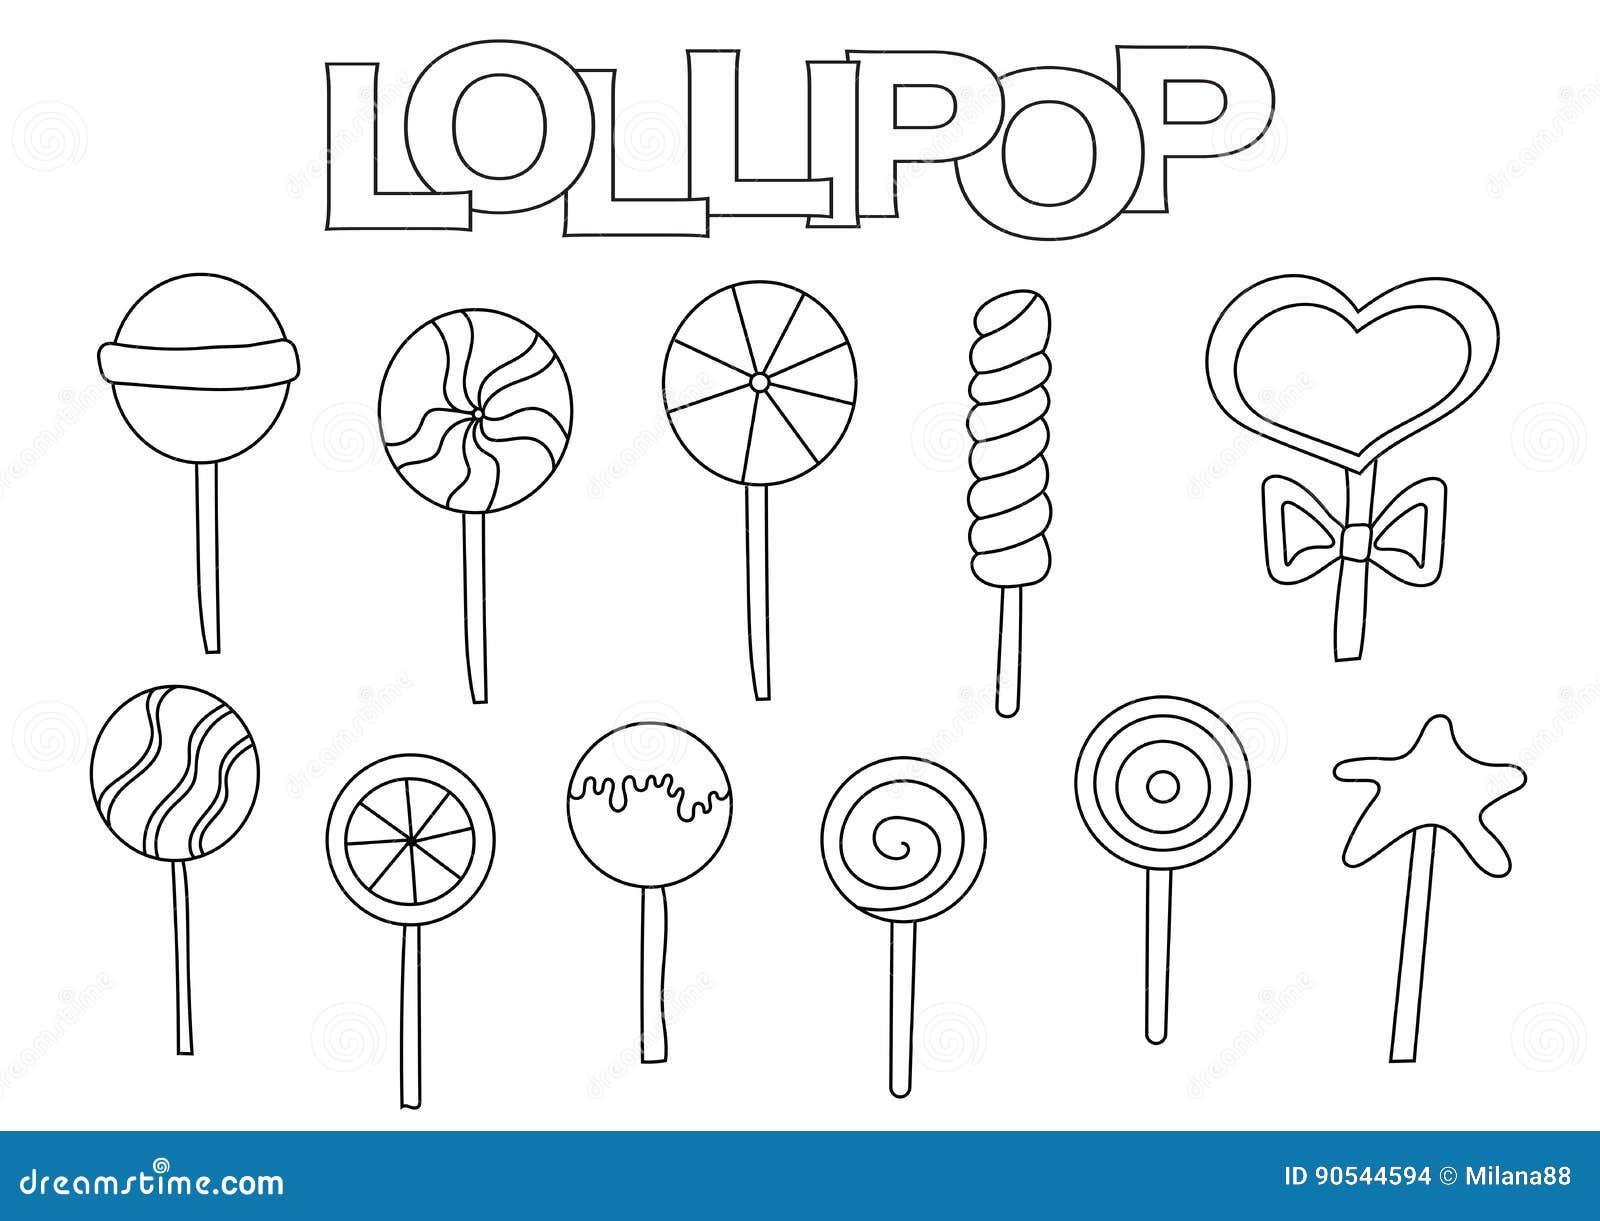 Lollipop Elements Hand Drawn Set. Coloring Book Template. Outline ...